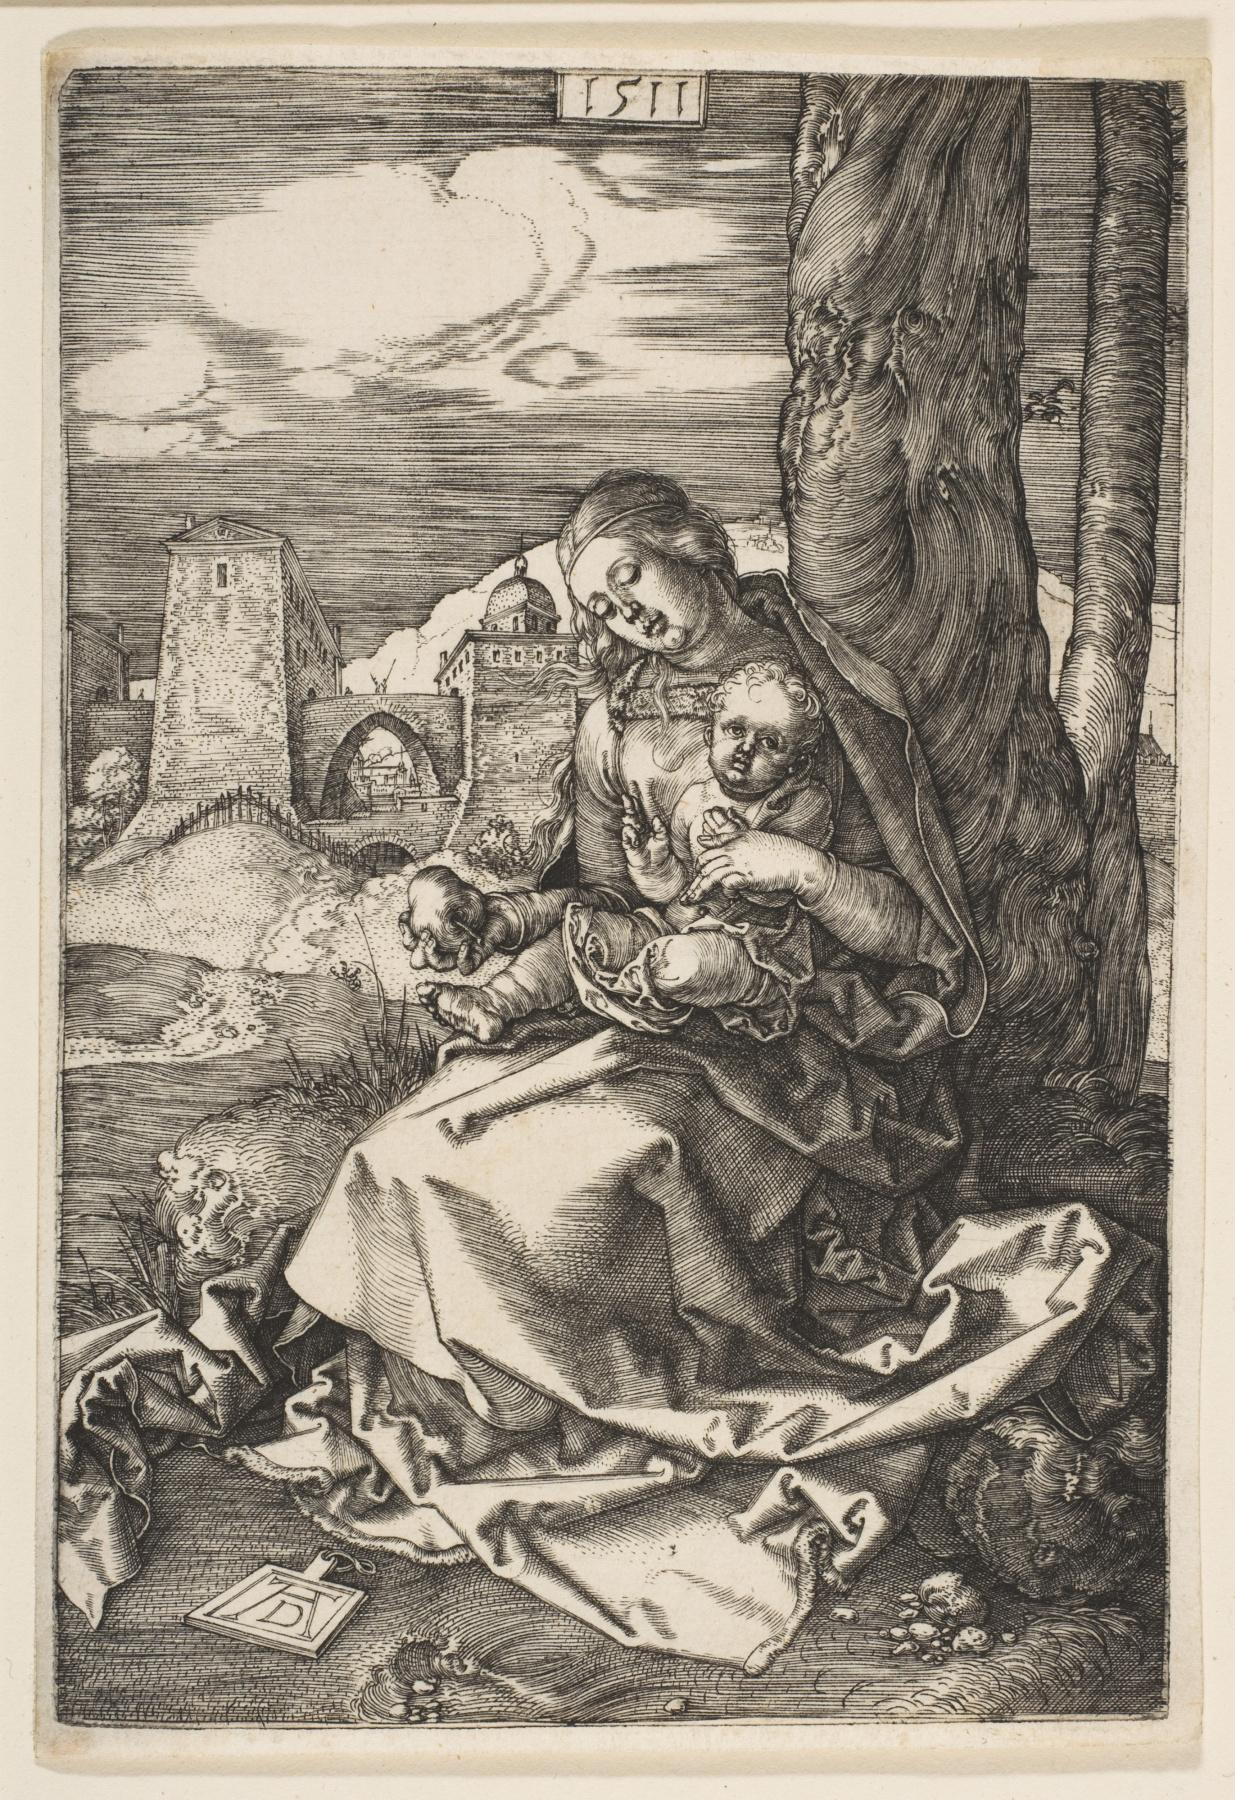 Albrecht Dürer. Madonna and child with a pear